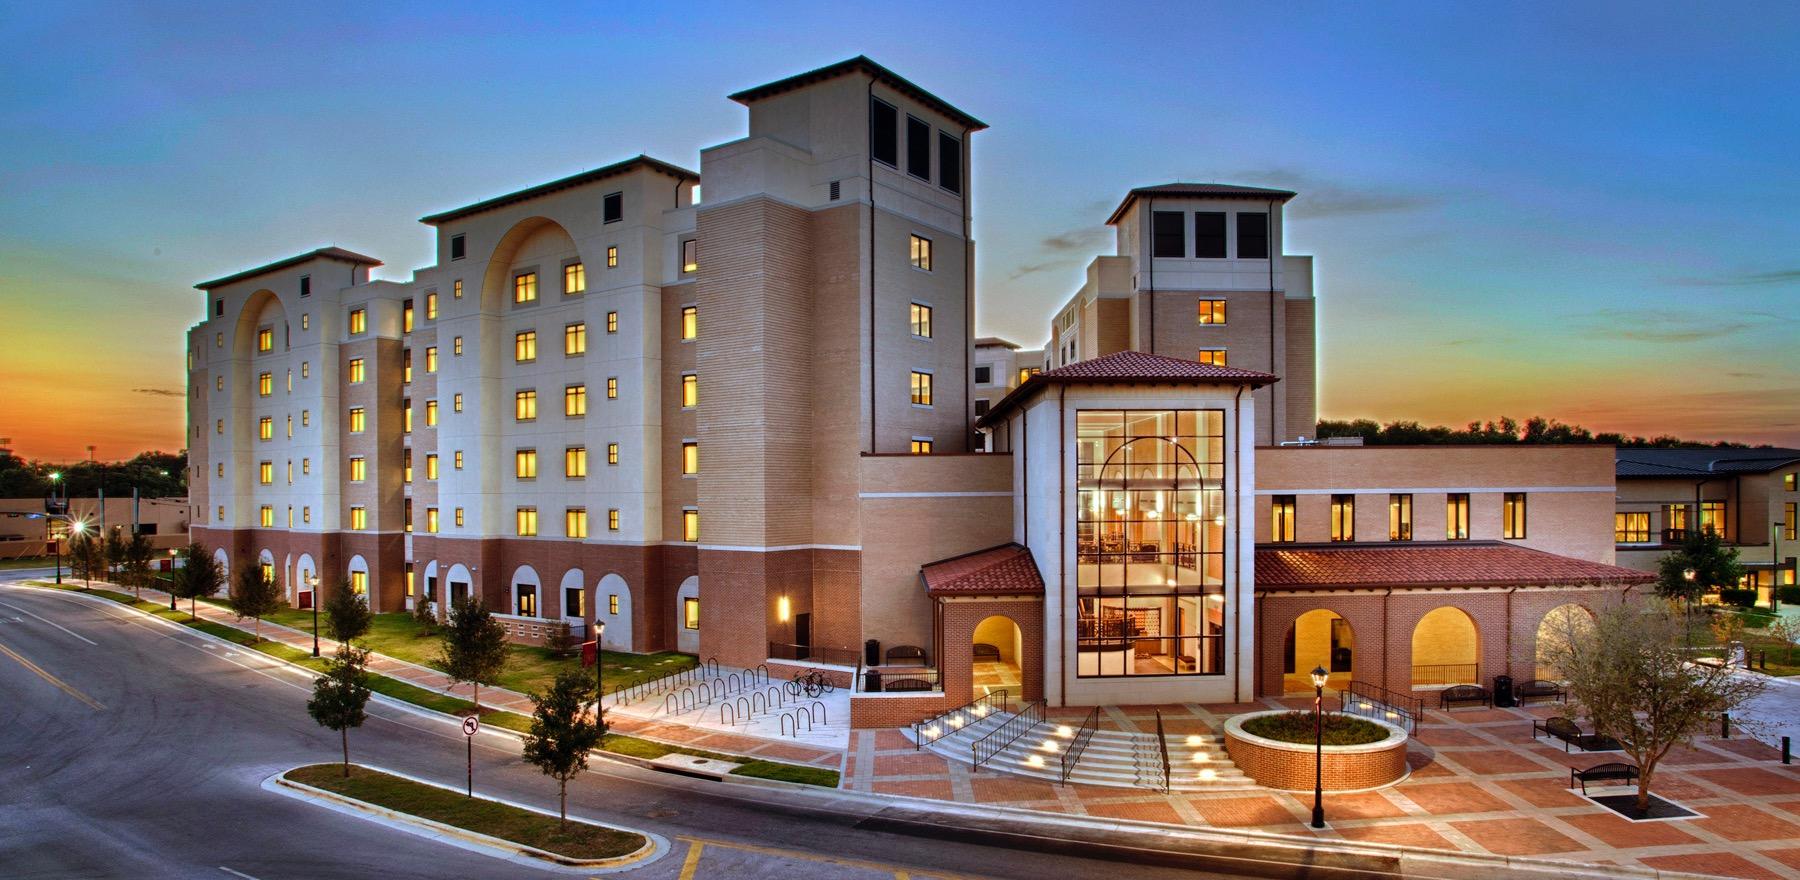 MW Texas State University